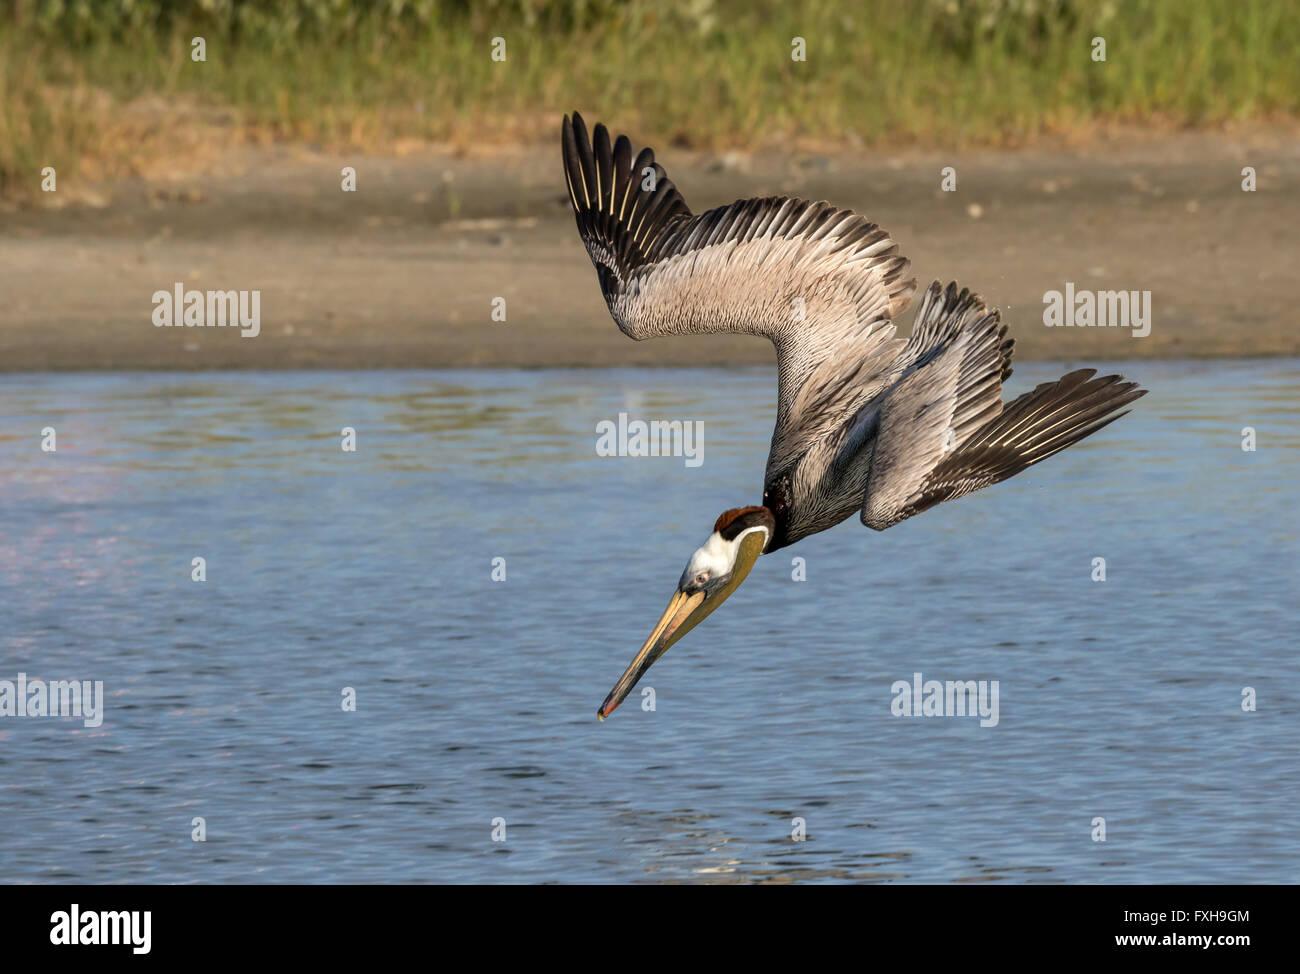 Brown pelican (Pelecanus occidentalis) hunting, Galveston, Texas, USA. - Stock Image